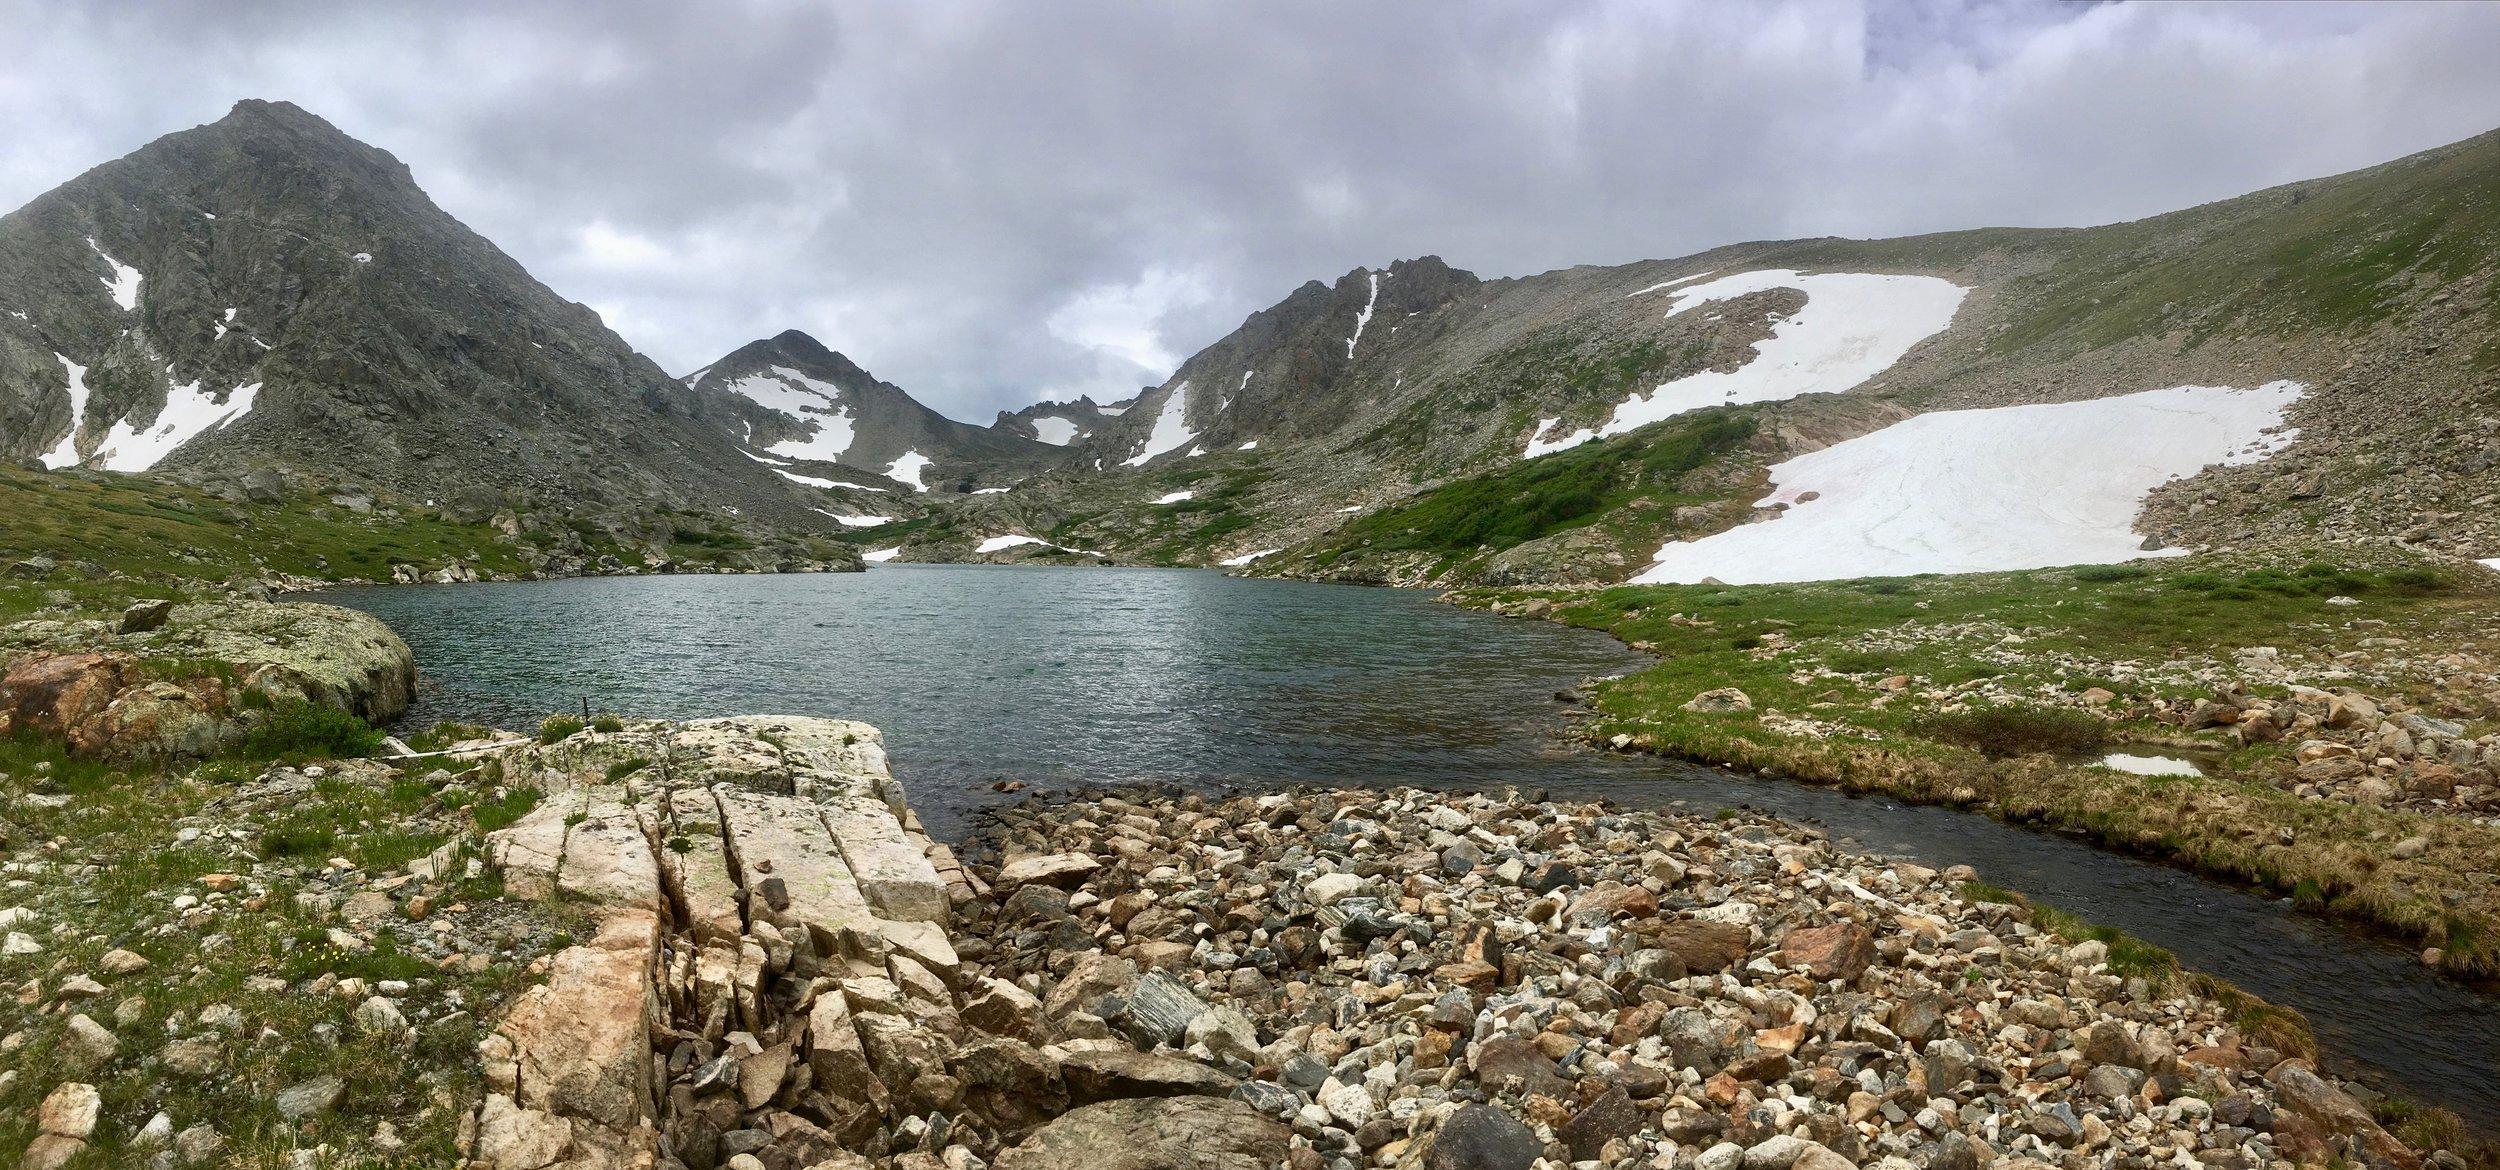 Green Lake 4 (photo credit: Kelly Loria)